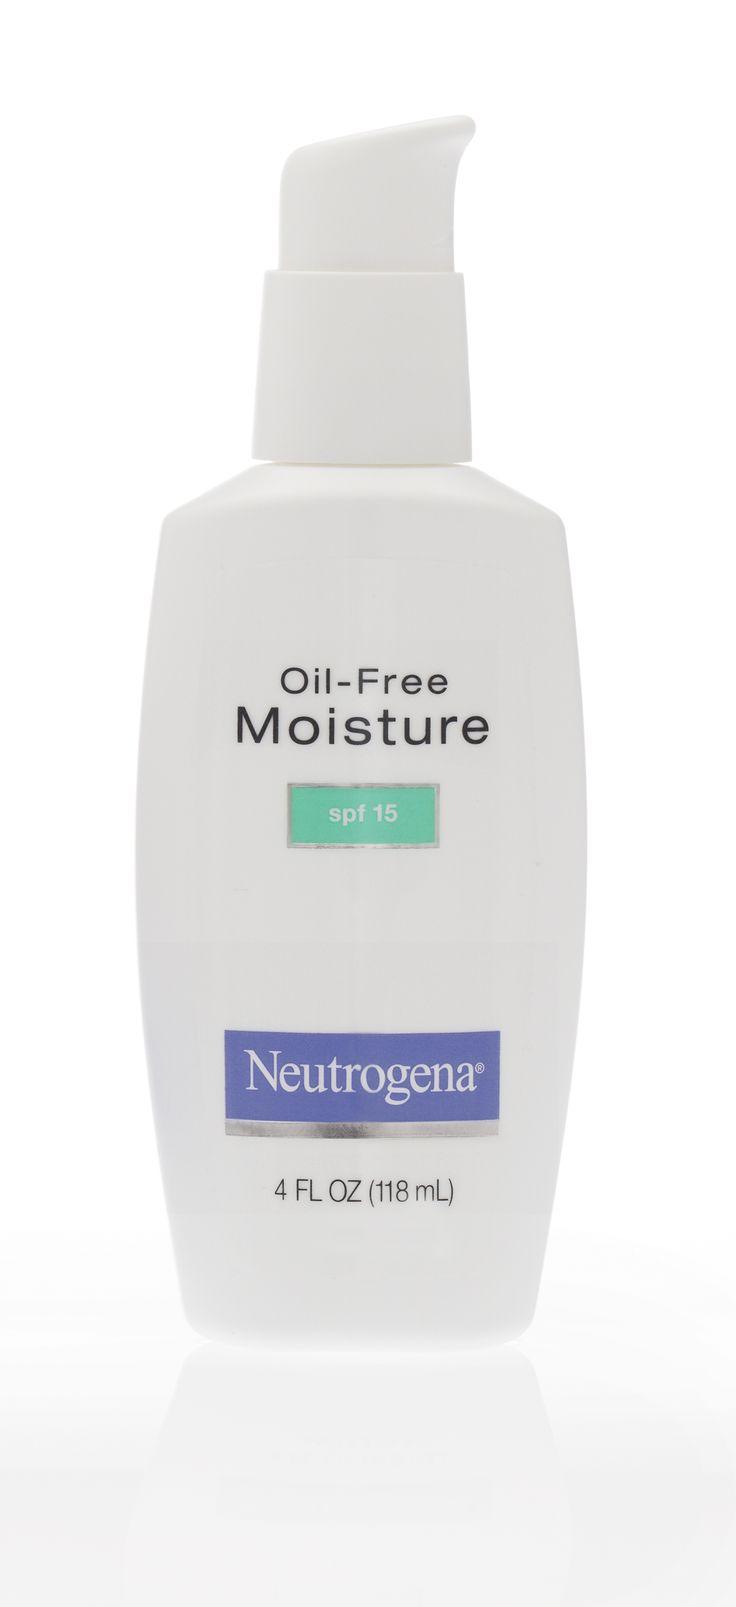 Neutrogena Oil-Free Moisture.